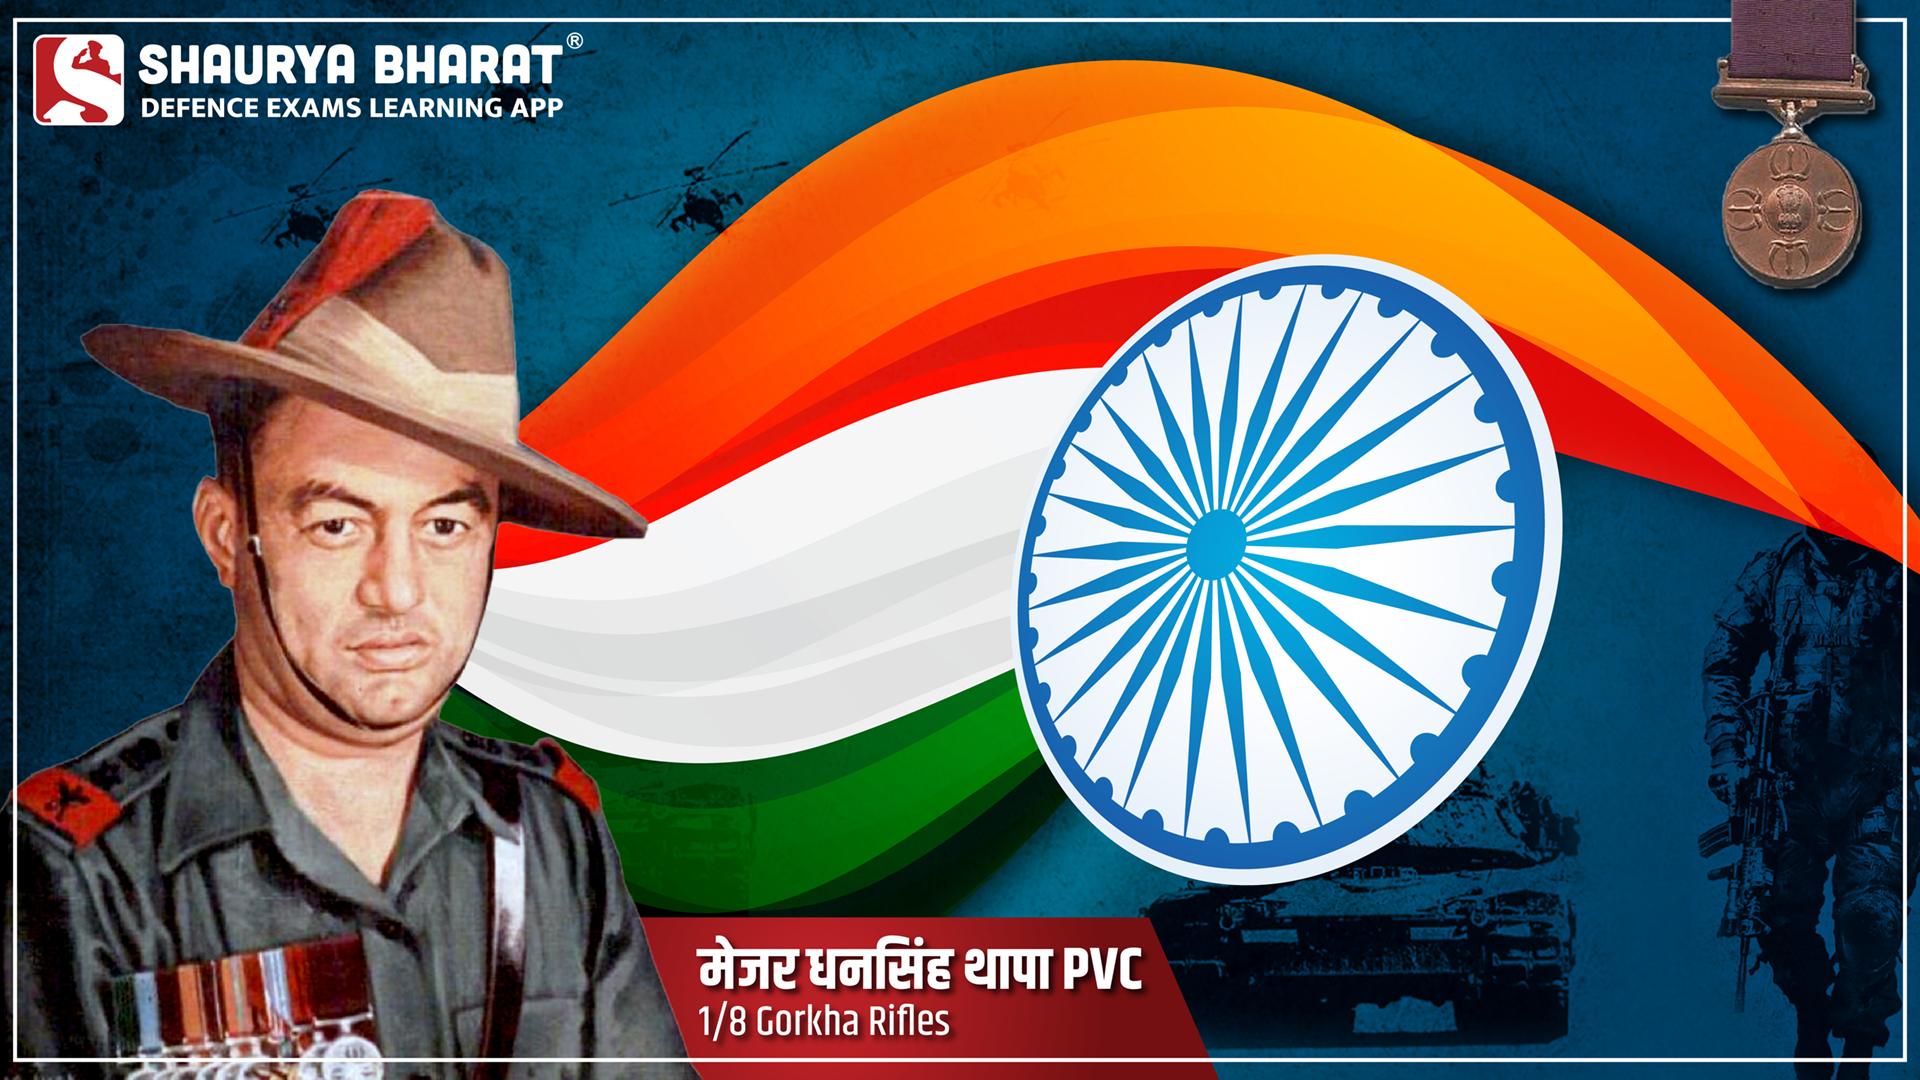 Major Dhan Singh Thapa, PVC